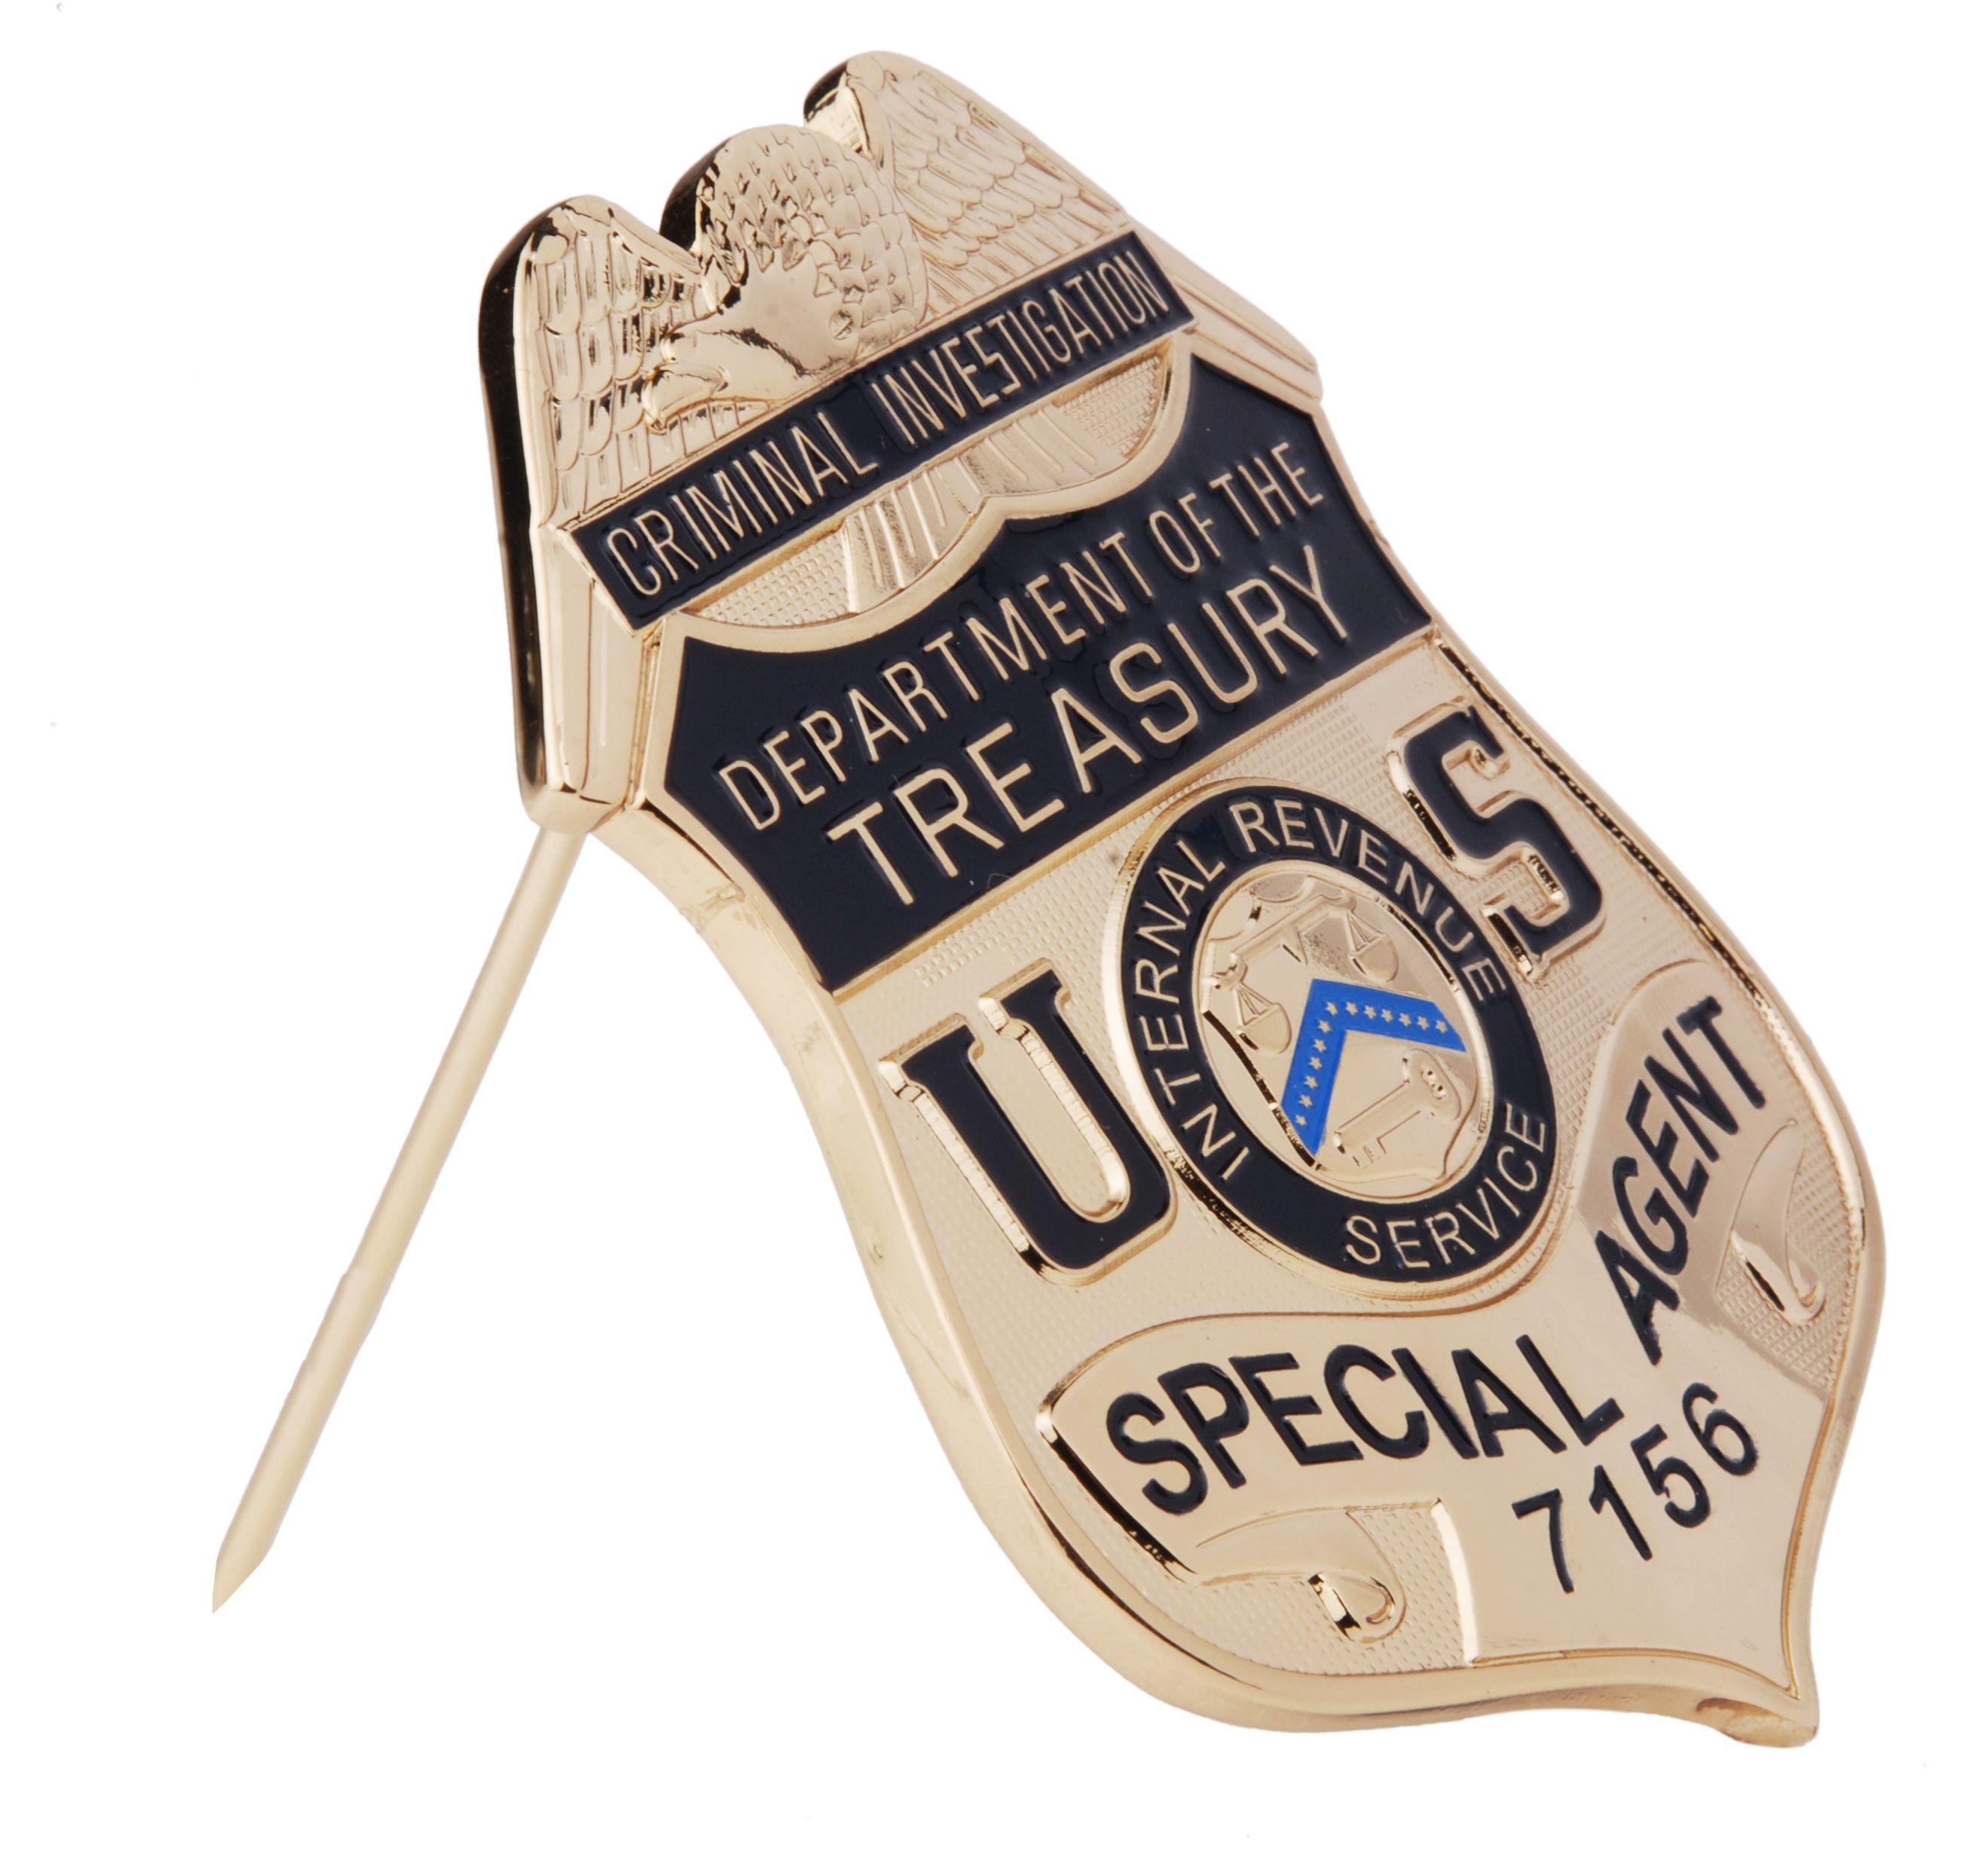 Us criminal investigation department of the treasury special agent metal badge 32705 metal - Criminal bureau of investigation mn ...